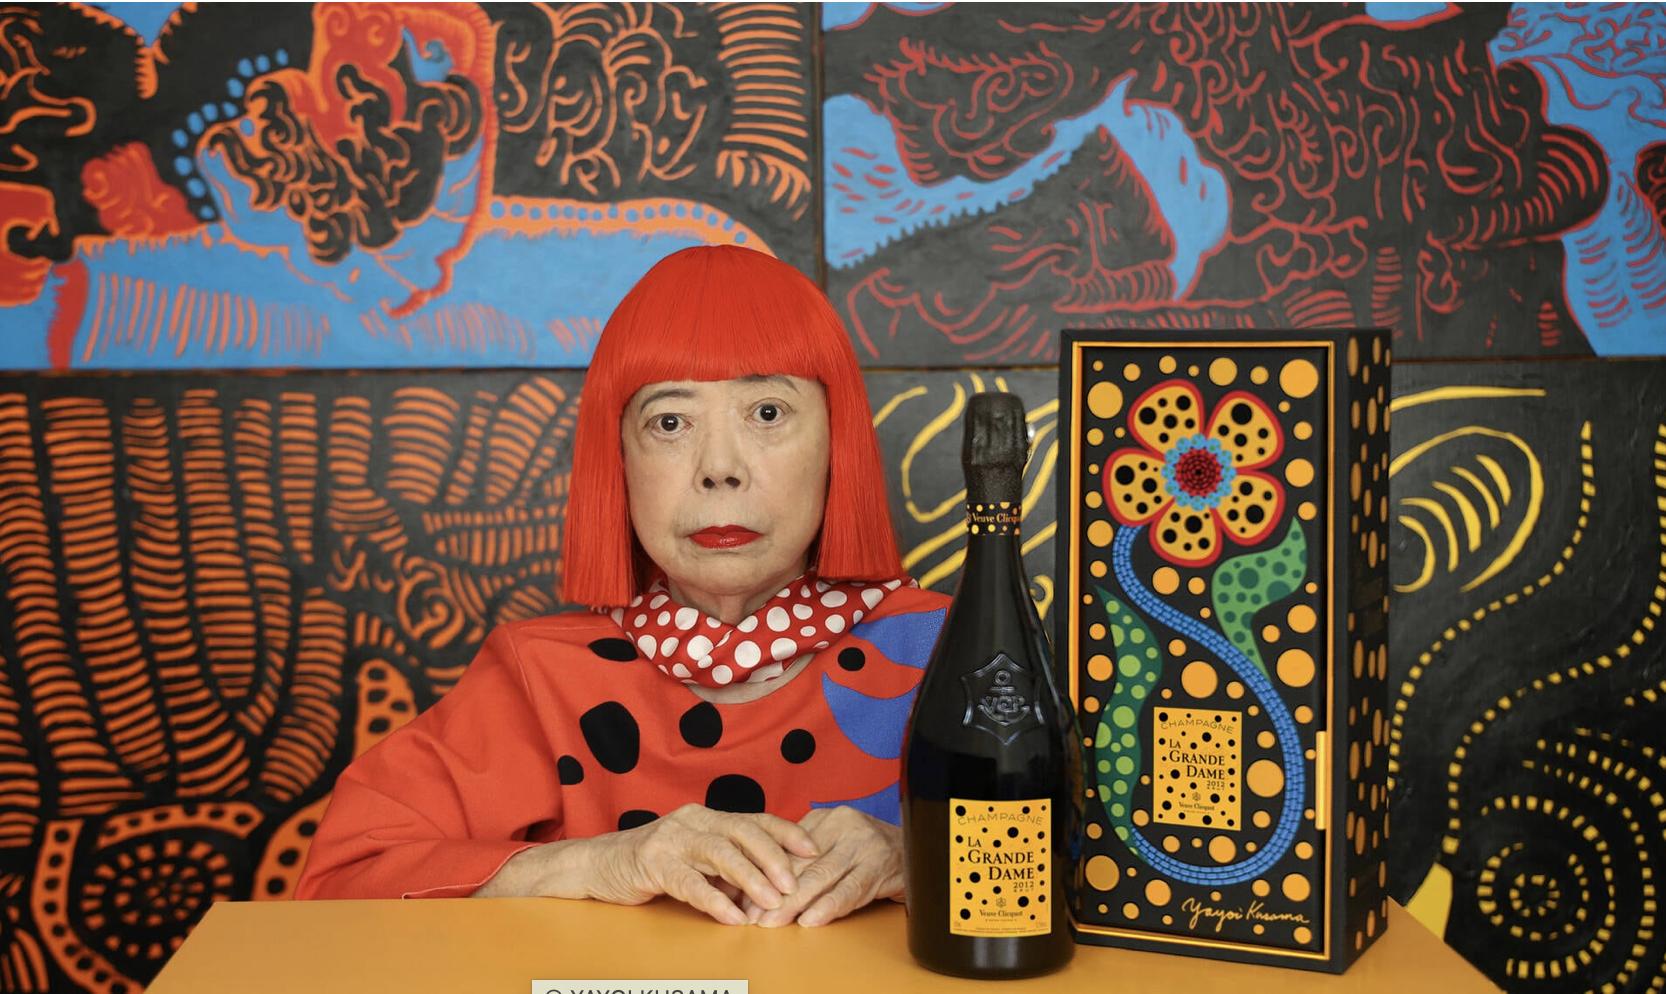 Yayoi Kusama voor Vve Clicquot Grande Dame 2012